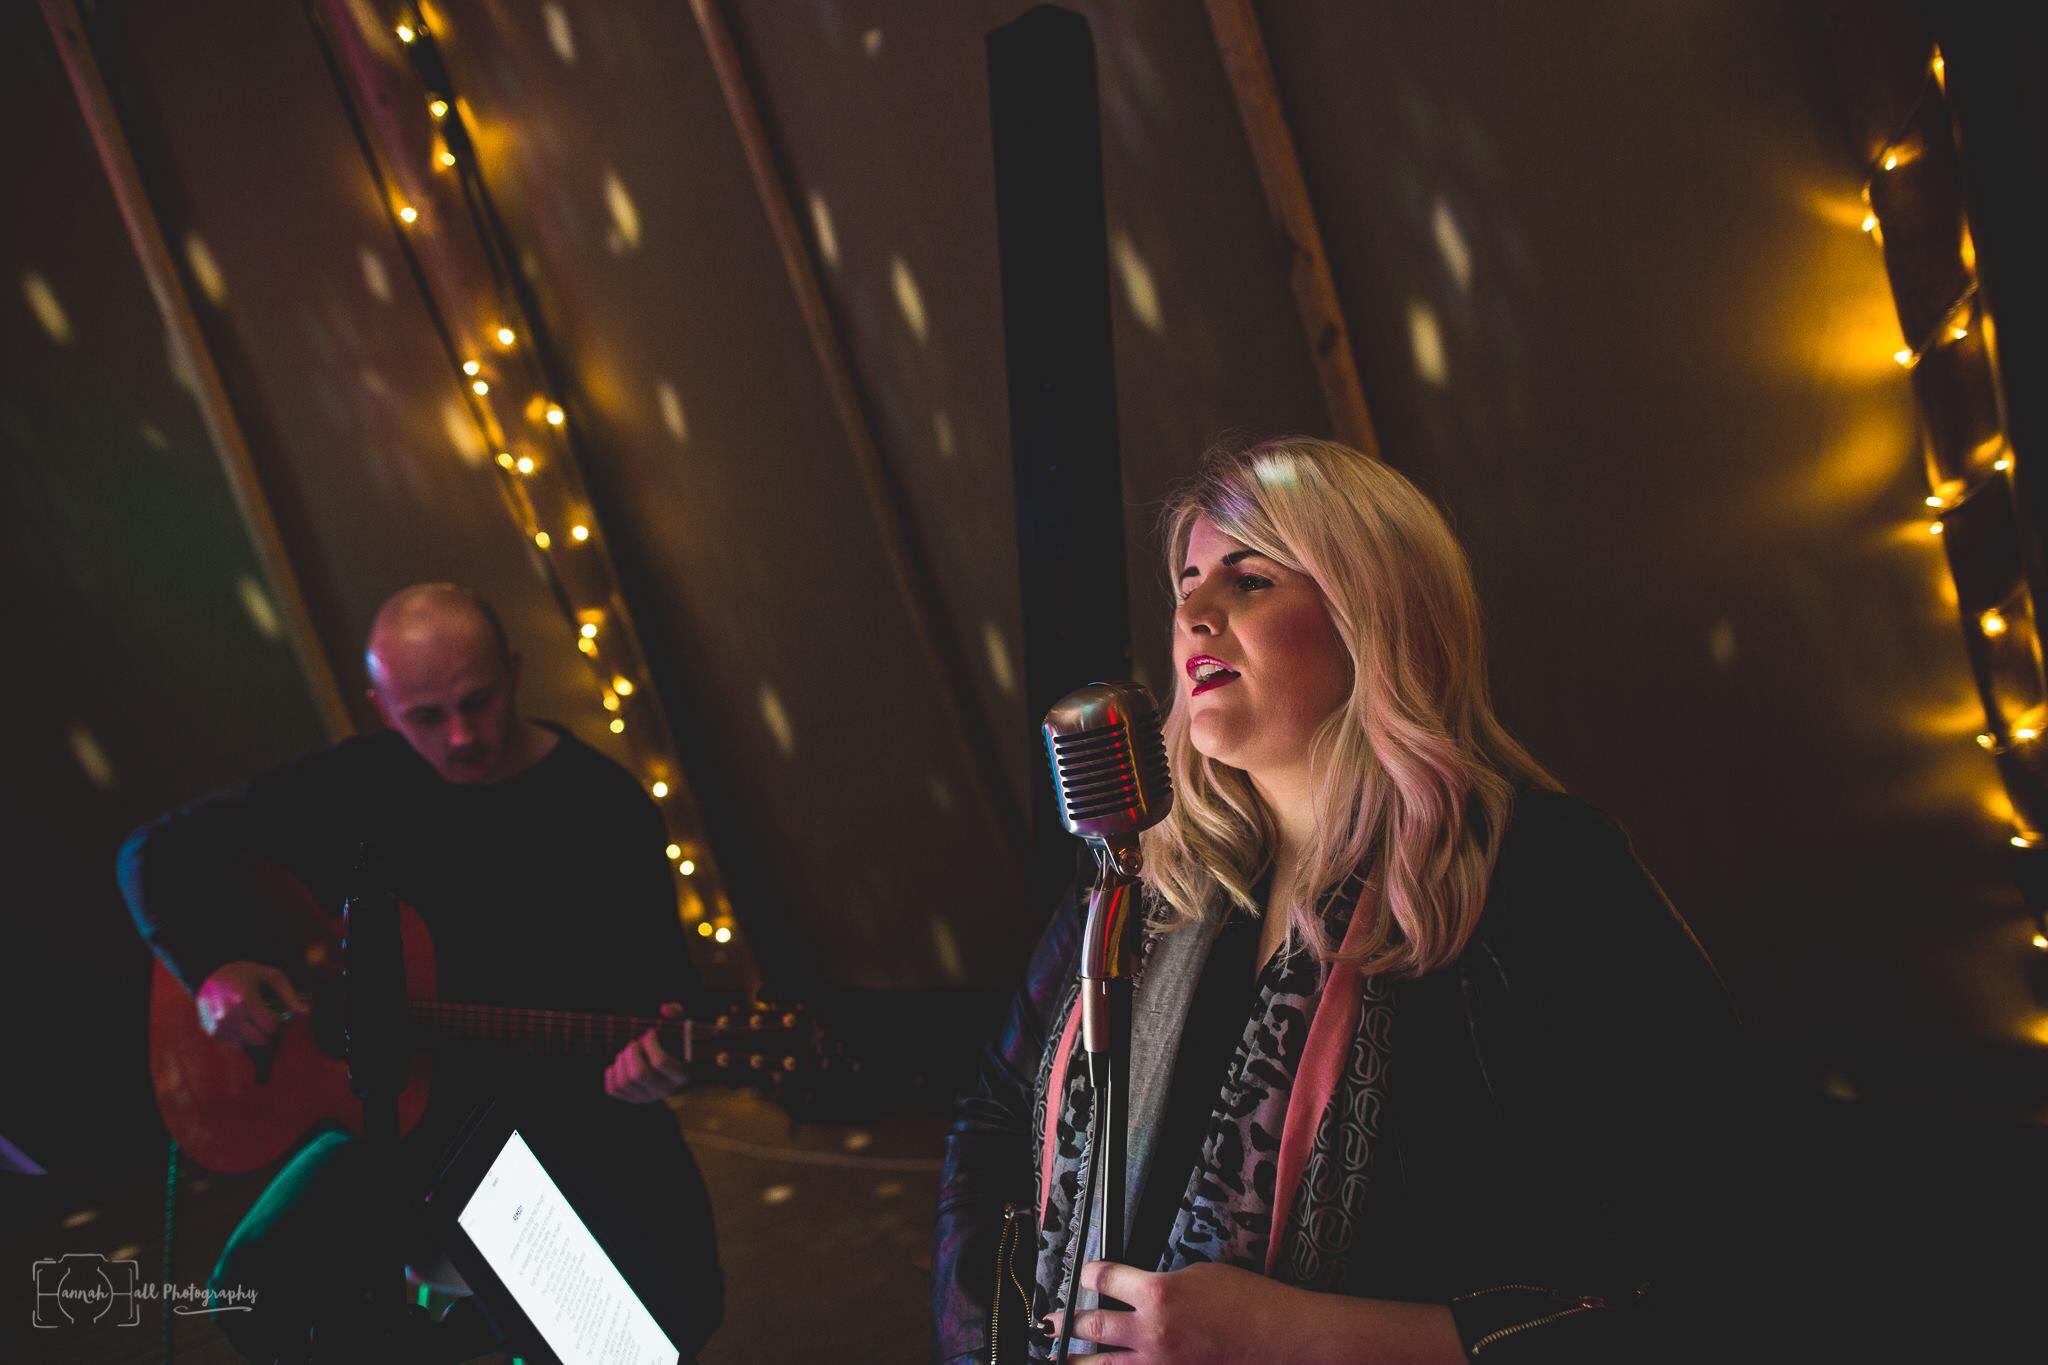 Leicester Wedding Singer